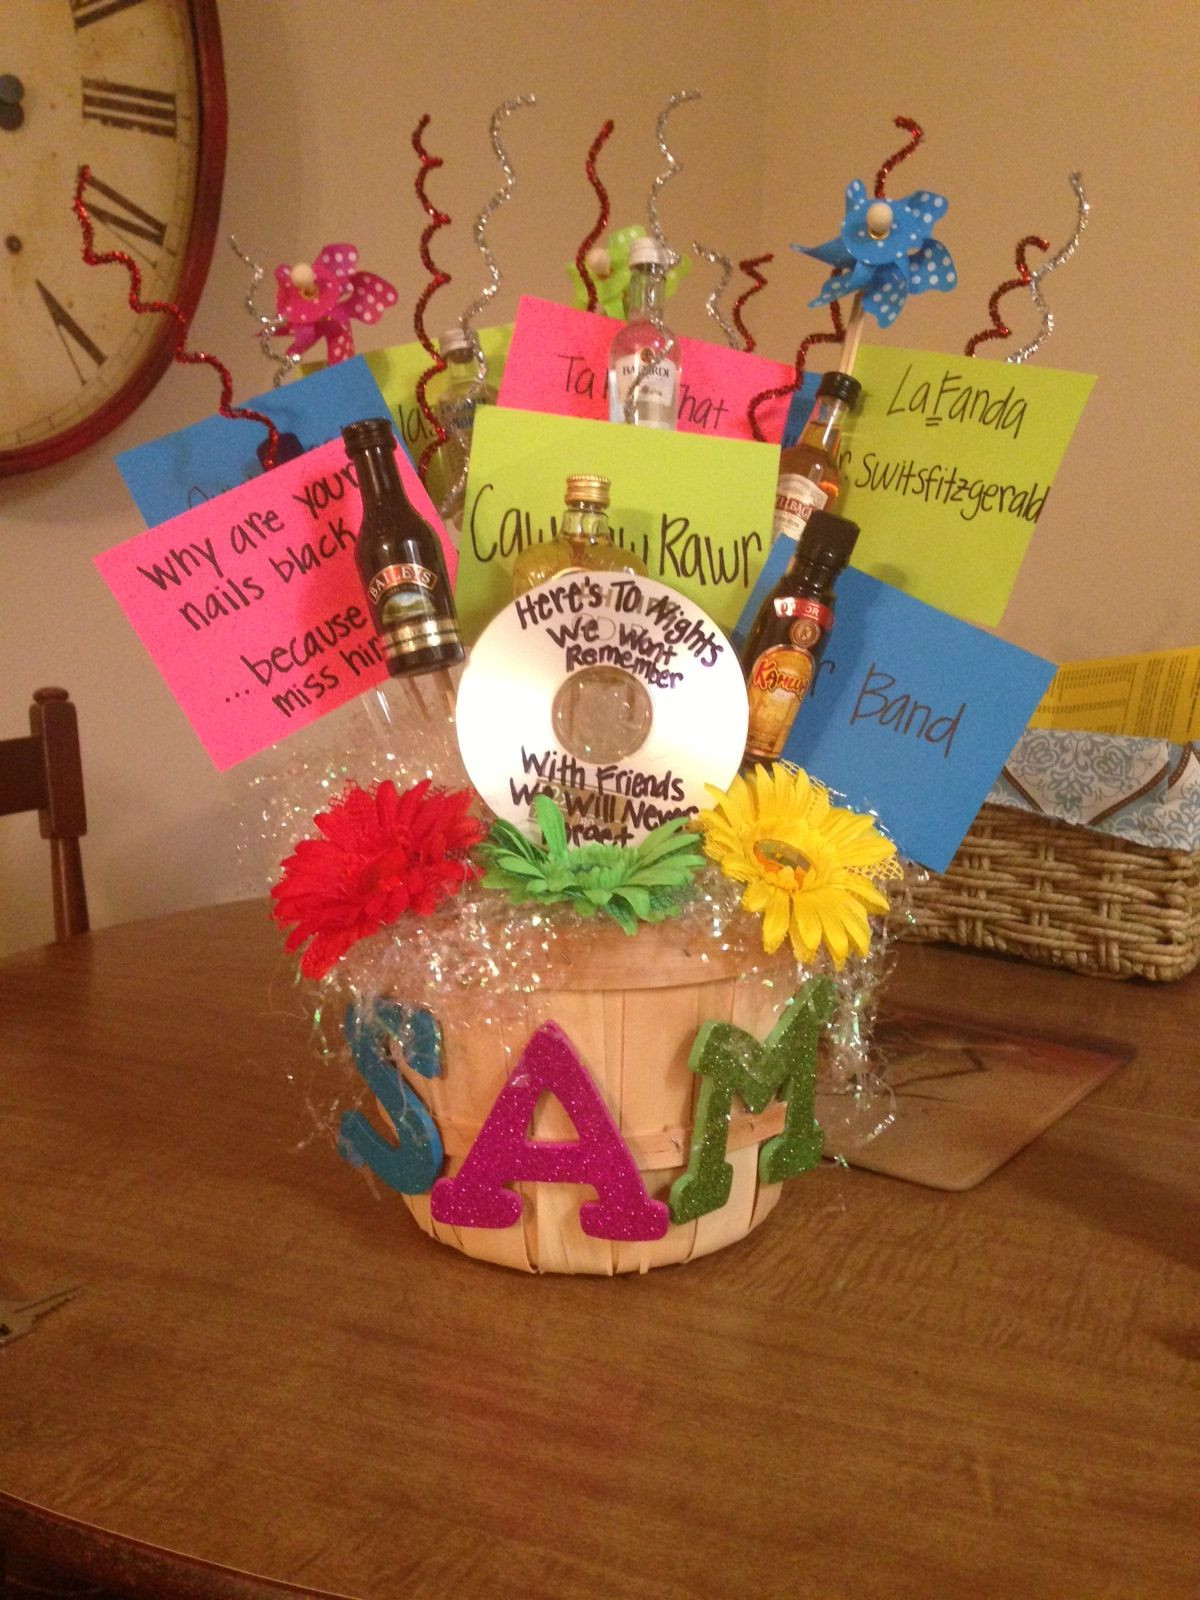 Gift Basket Ideas For Friends Birthday  Fun 21st birthday basket for my best friend Favorite